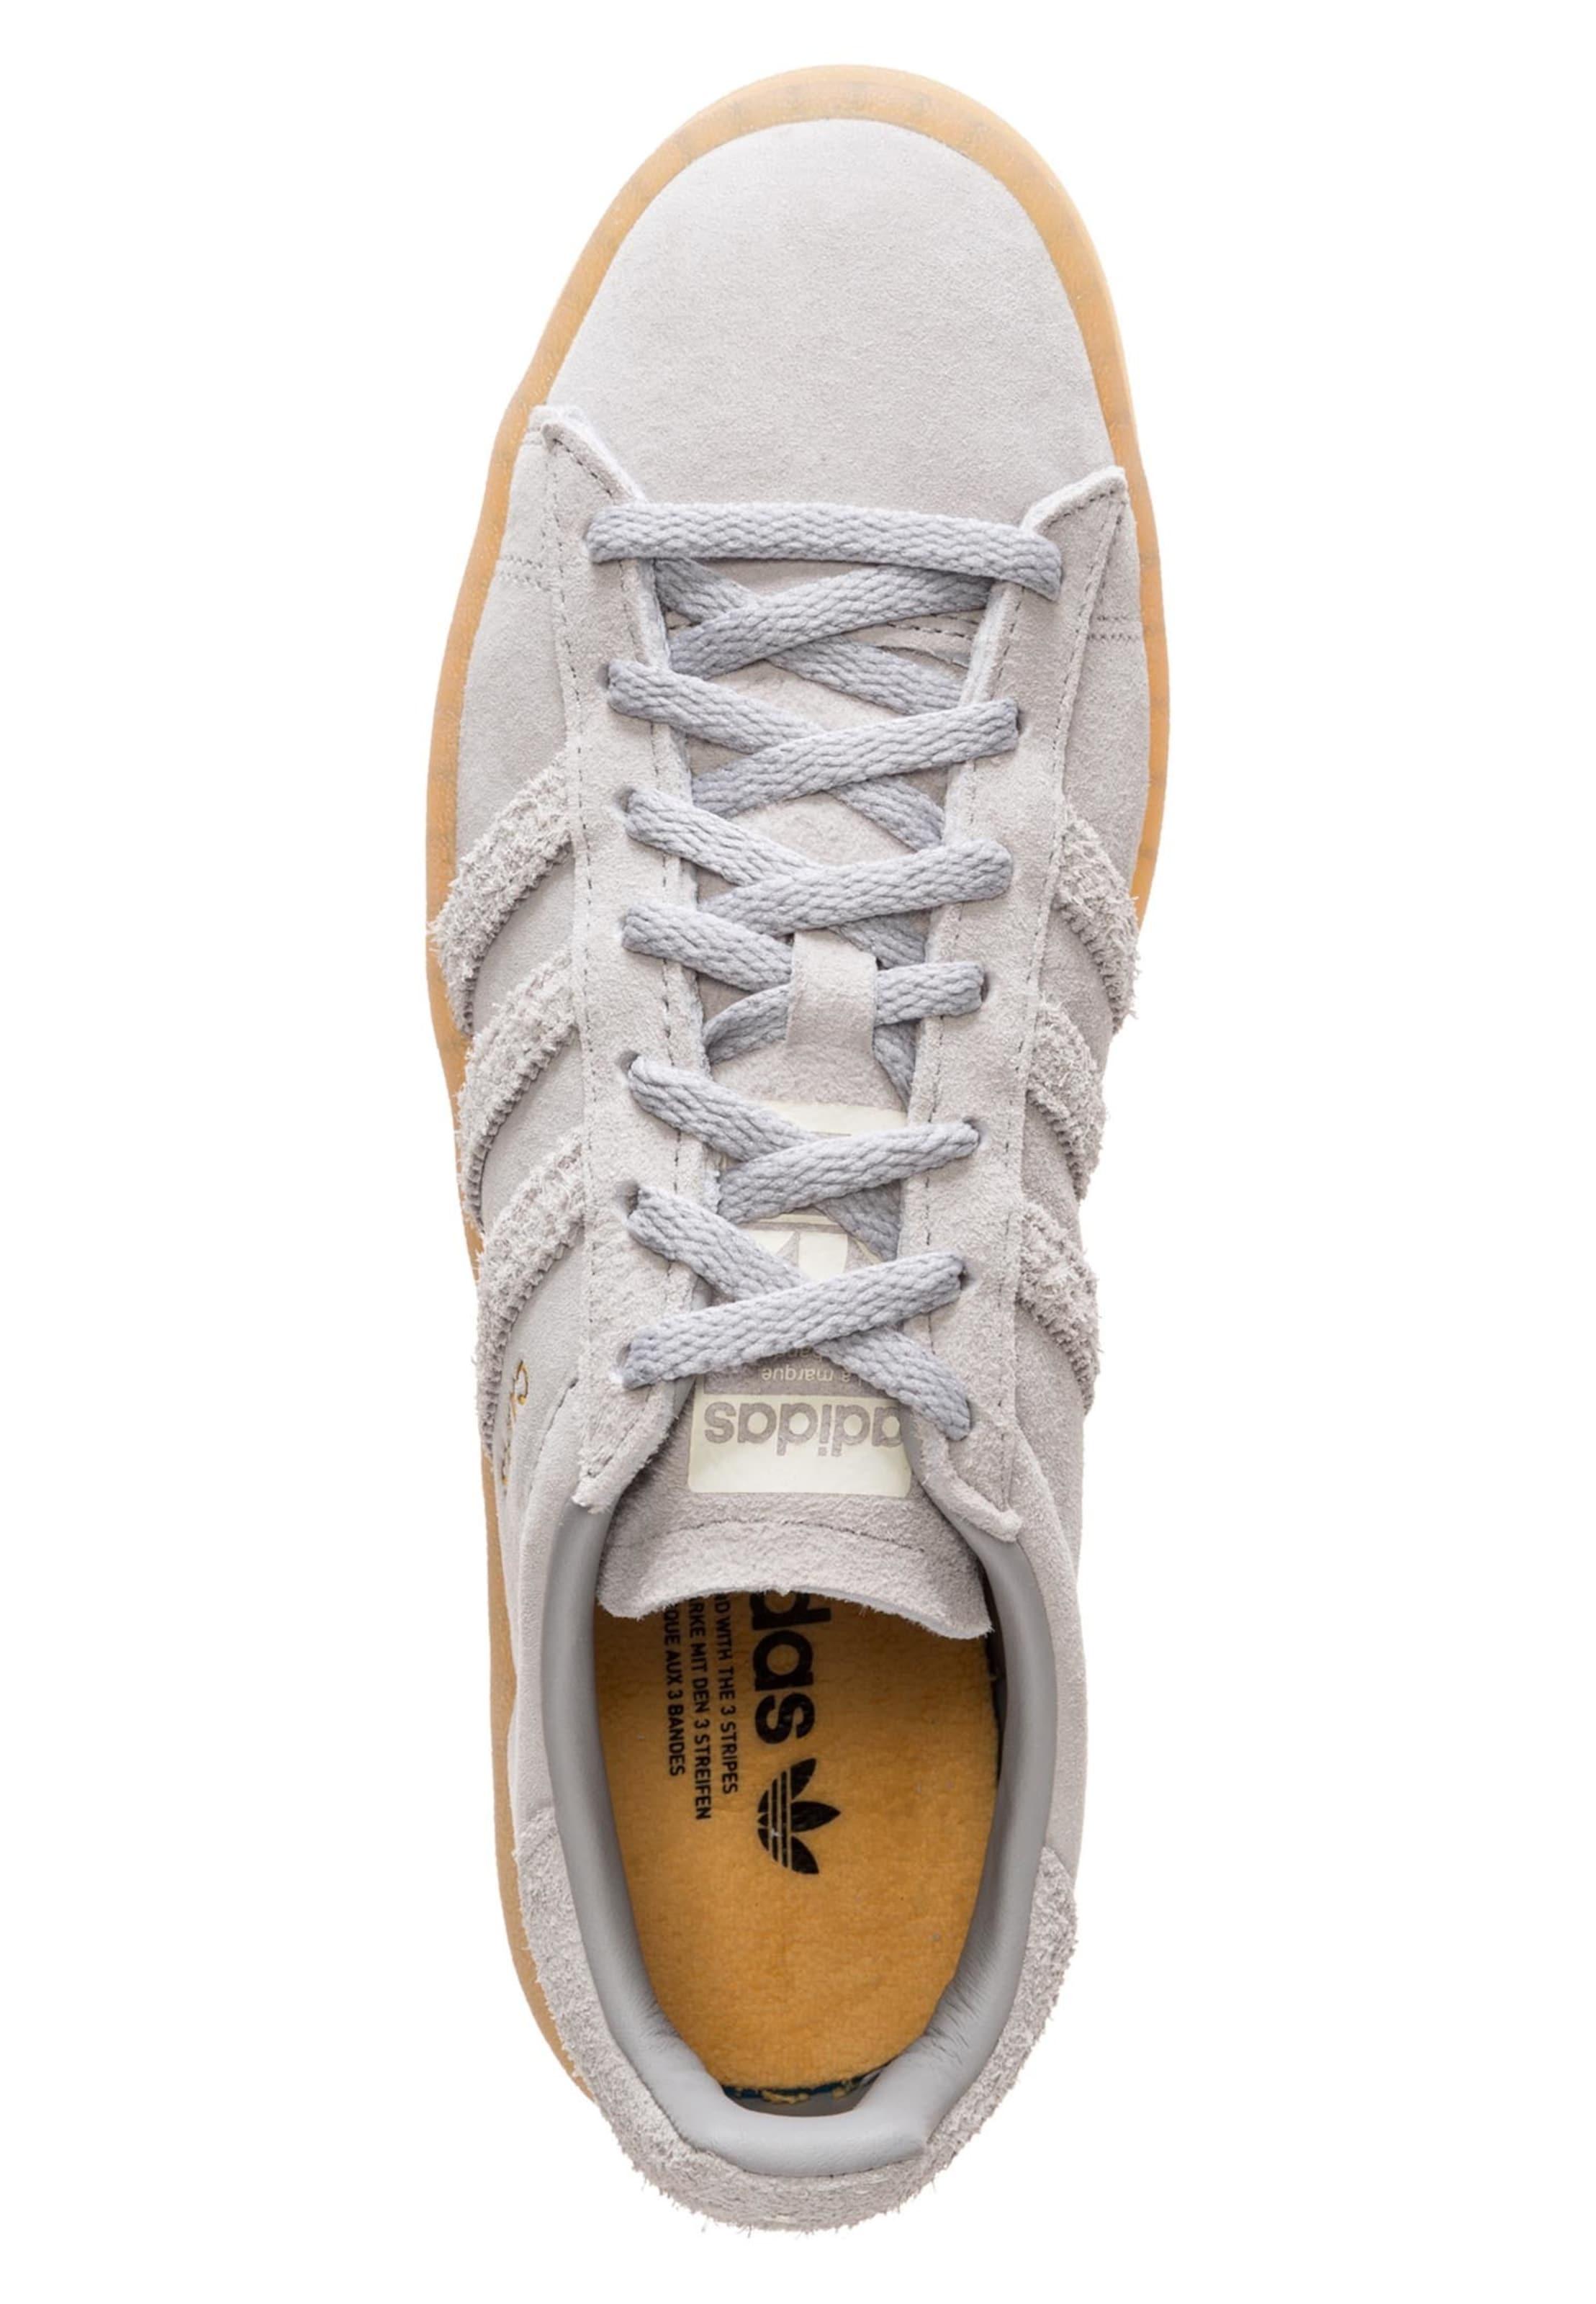 Adidas W Gum' 'campus Sneaker Originals In Creme ONn0kZ8wXP